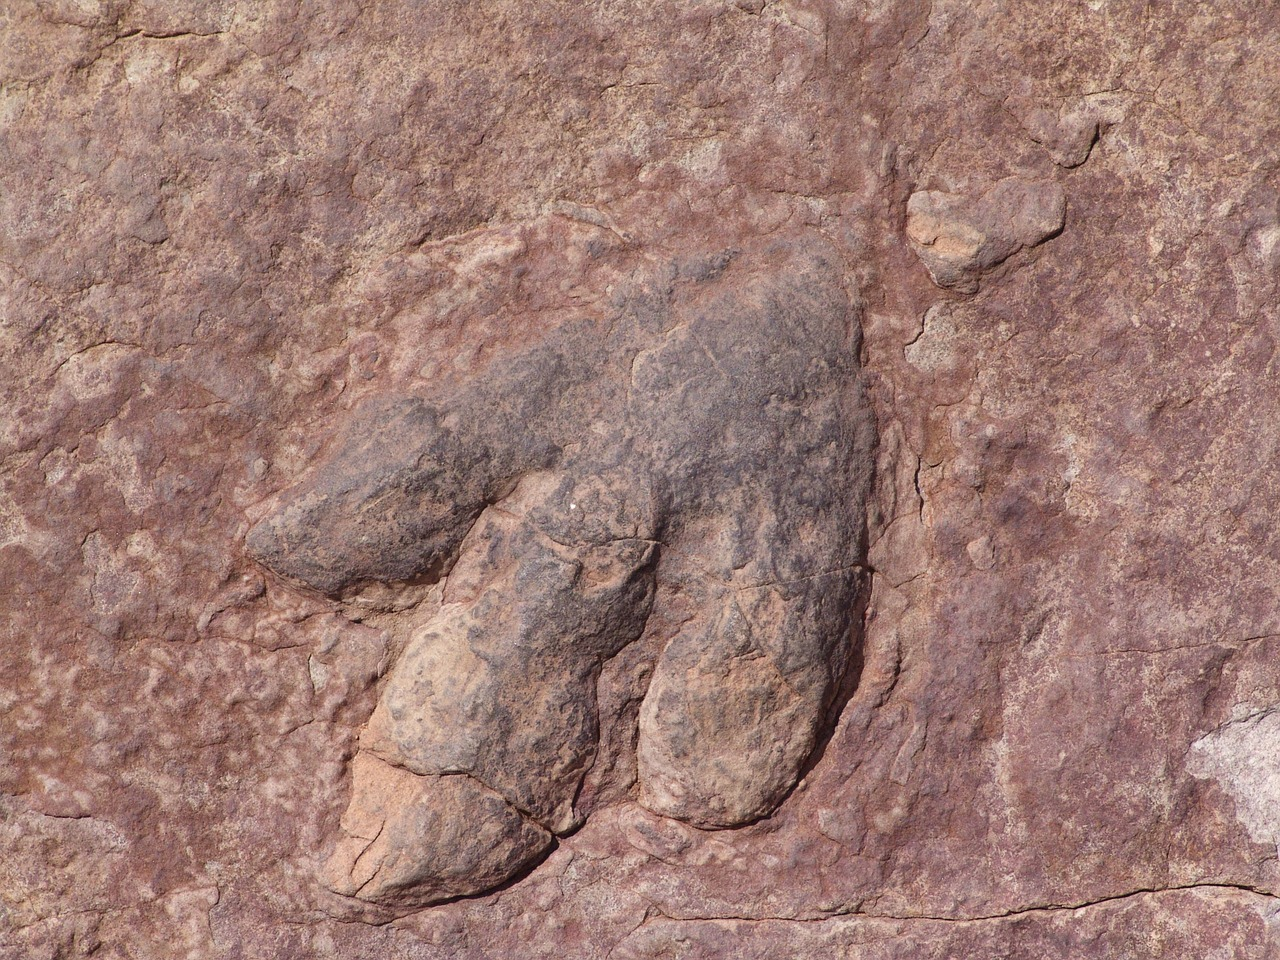 Une empreinte fossilisée de dinosaure